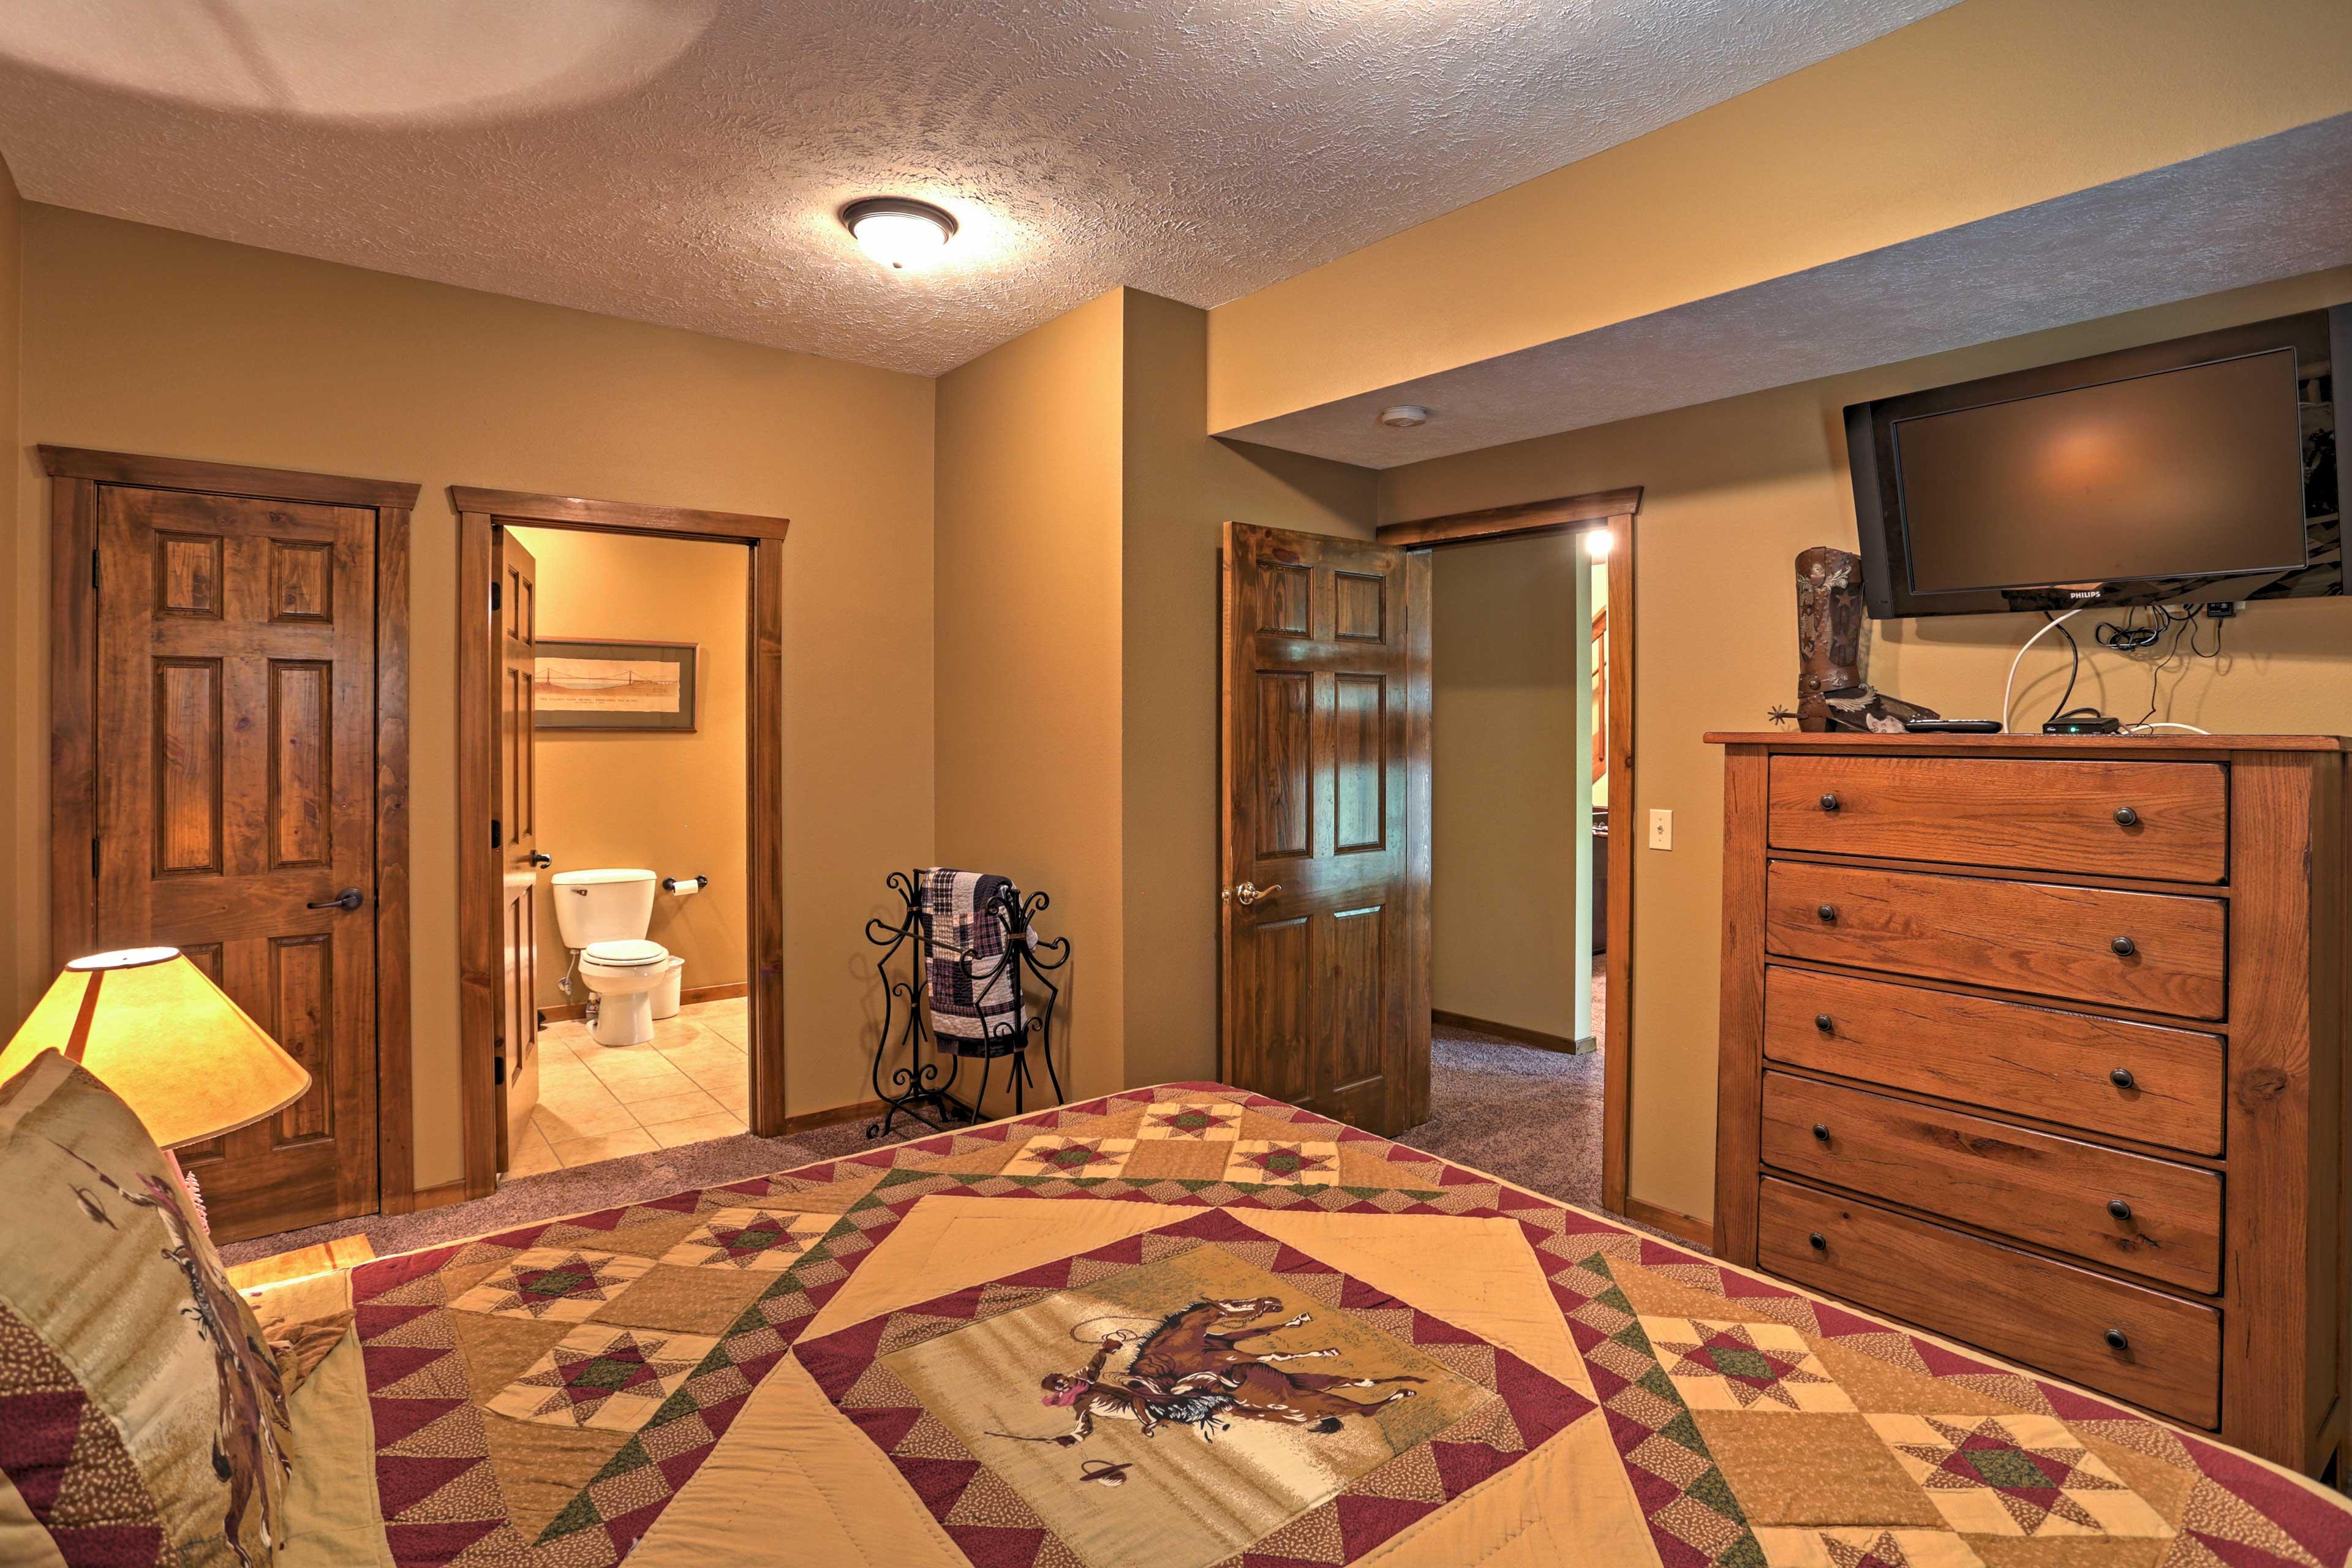 Bedroom 1 | King Bed | Plasma Cable TV | Linens Provided | En-Suite Bathroom